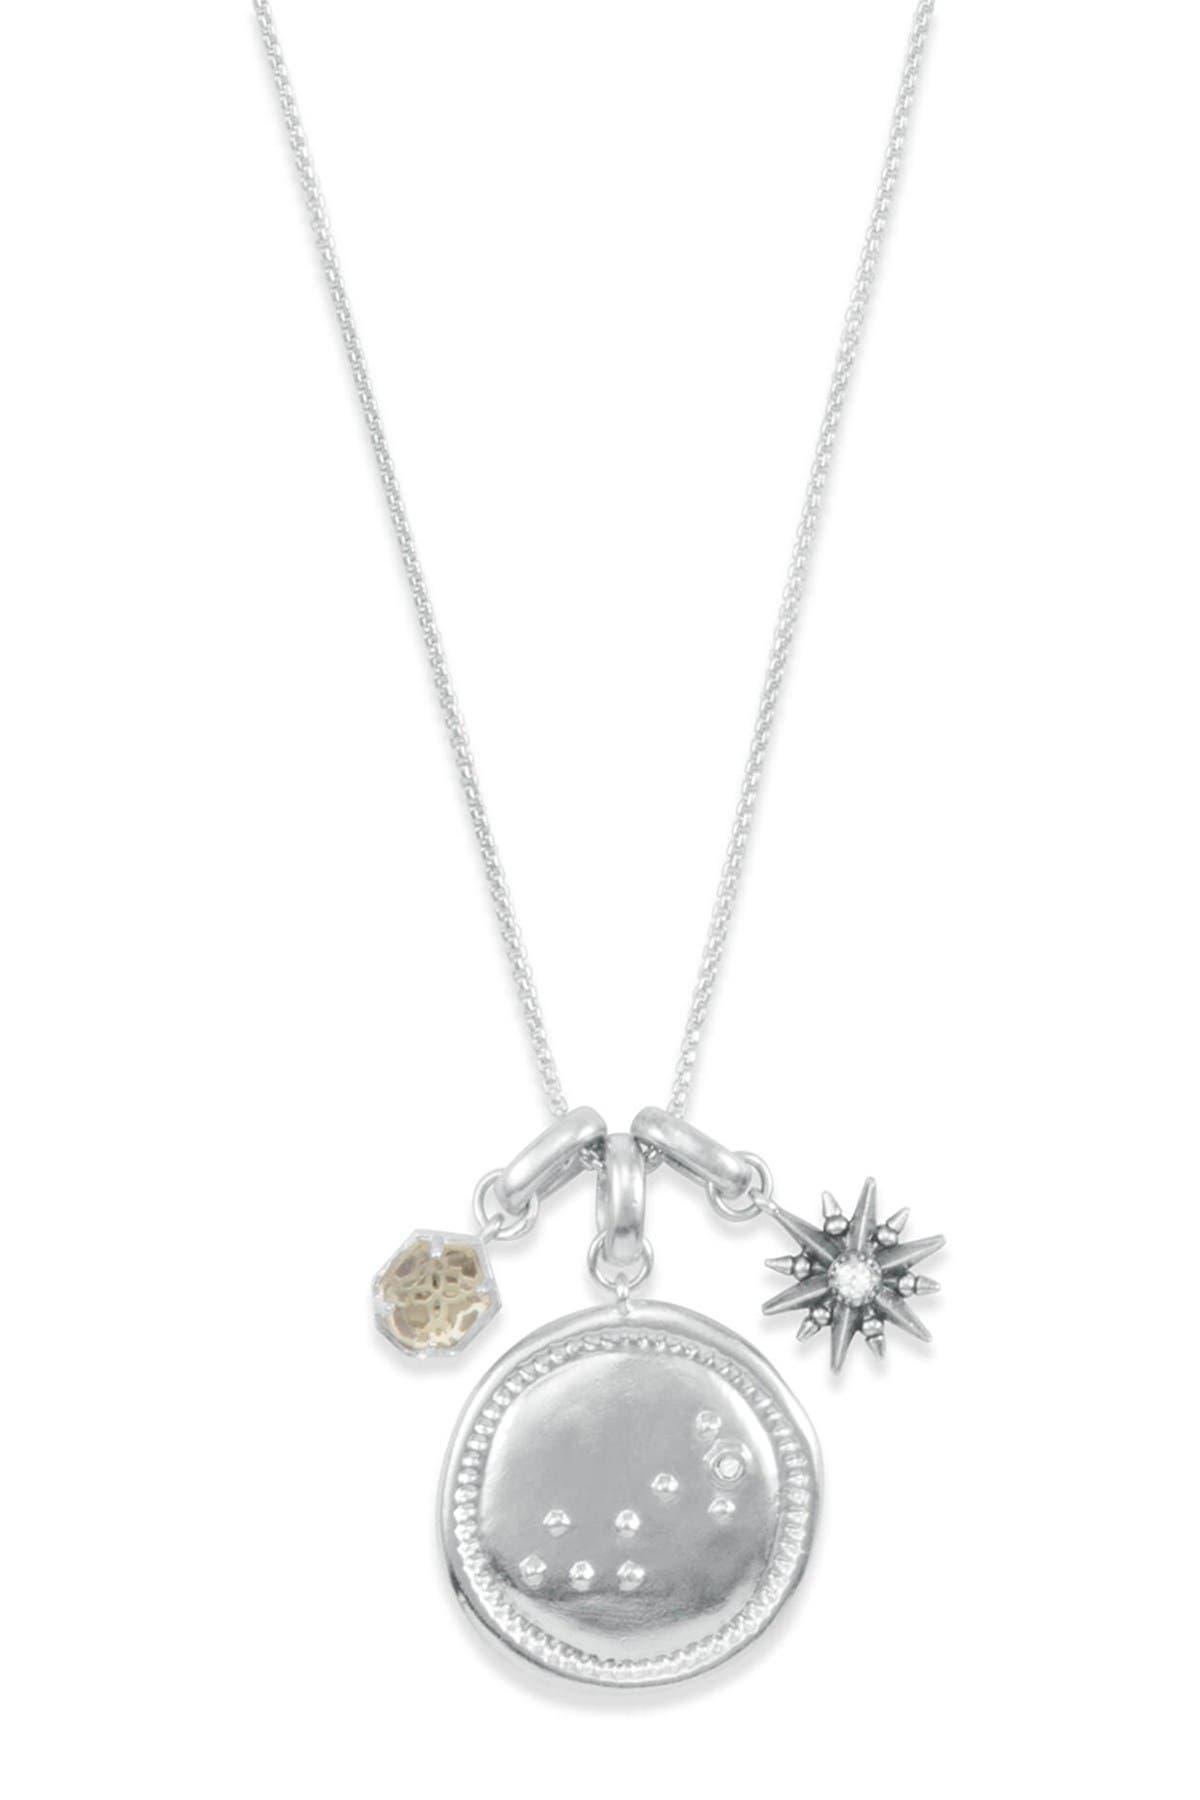 Image of Kendra Scott Rhodium Plated Scorpio Charm Necklace